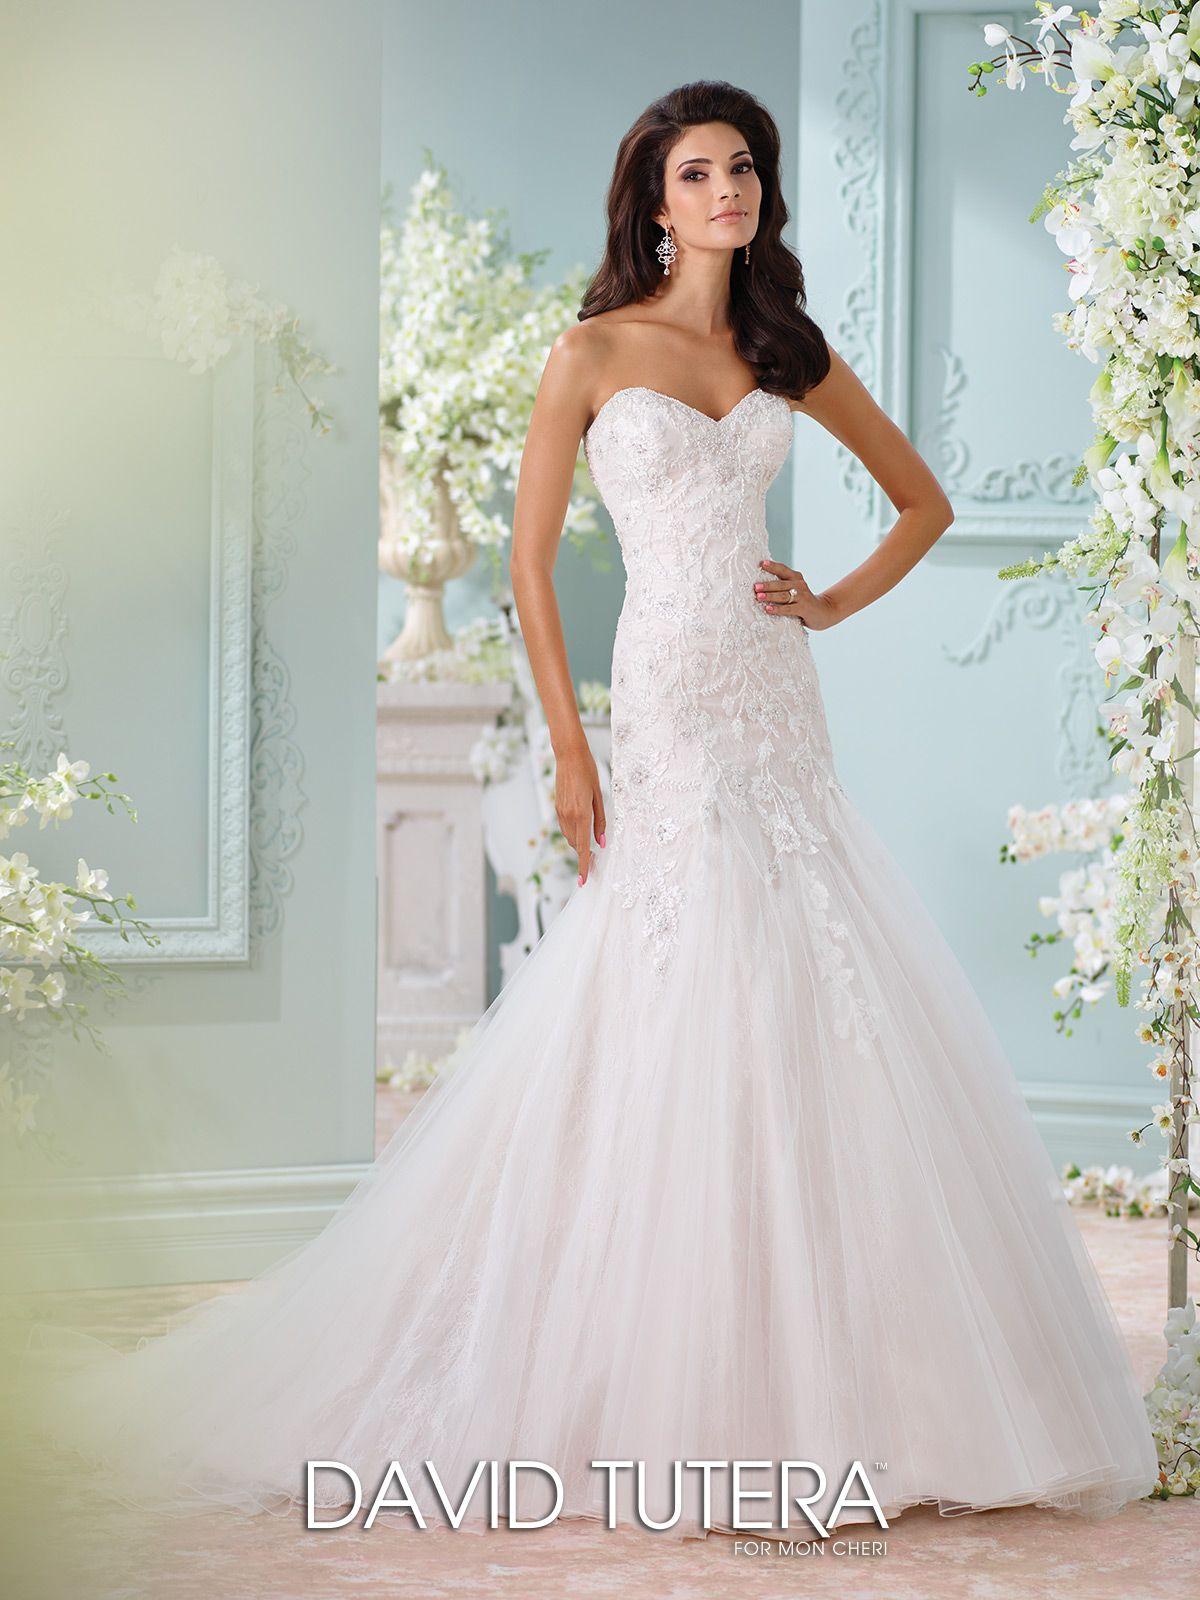 116224 | Martin Thornburg Inventory Gowns | Pinterest | Weddings